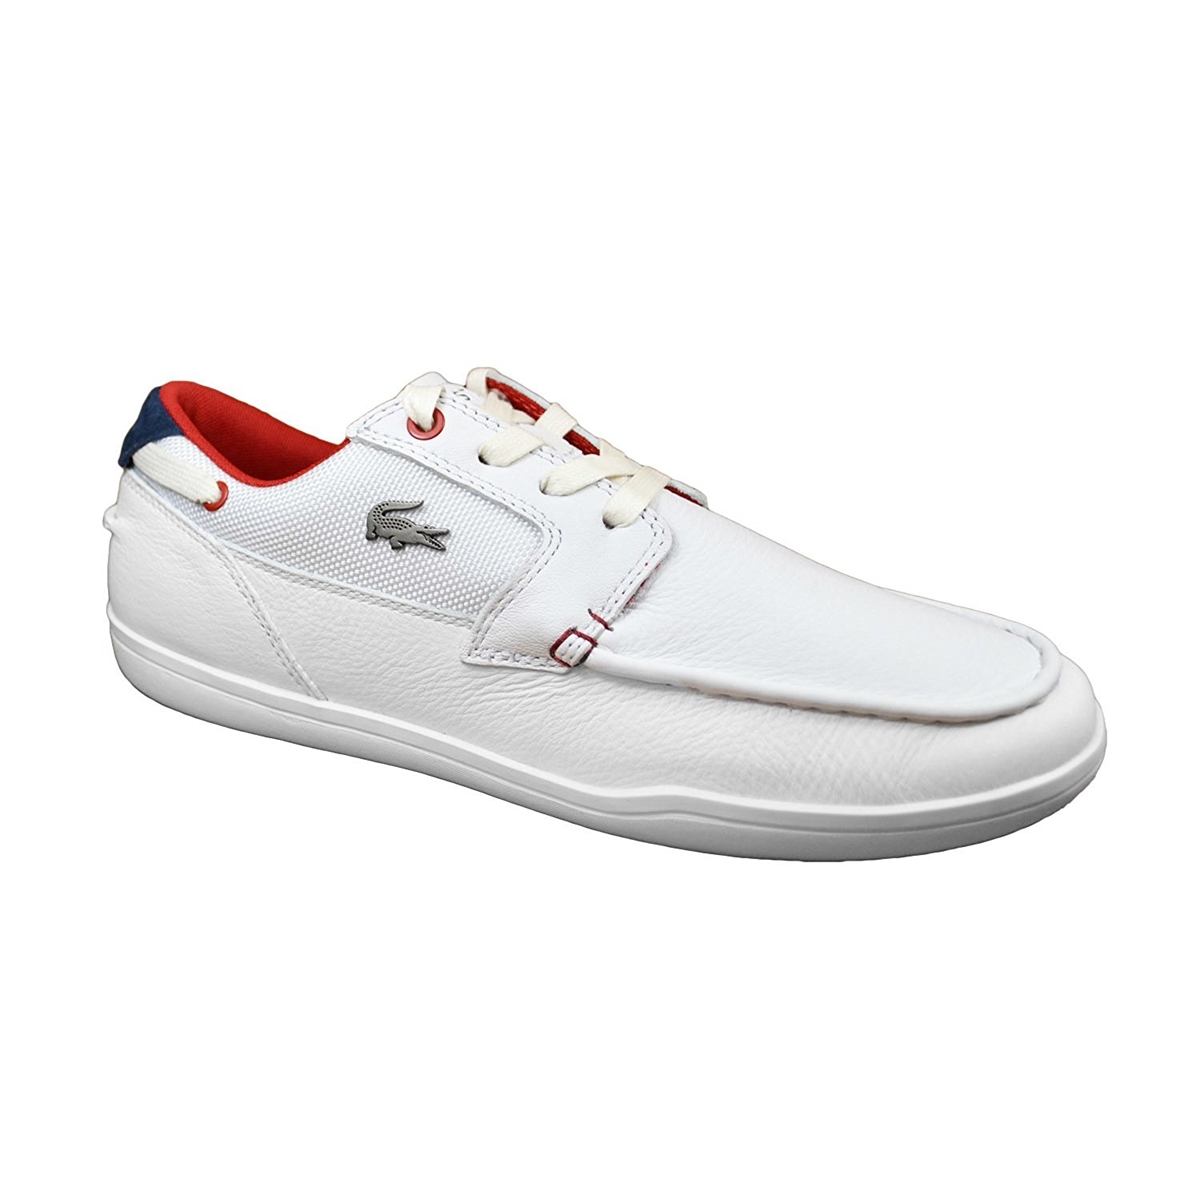 Lacoste Men Deck Minimal 317 Us Cam Fashion Sneakers